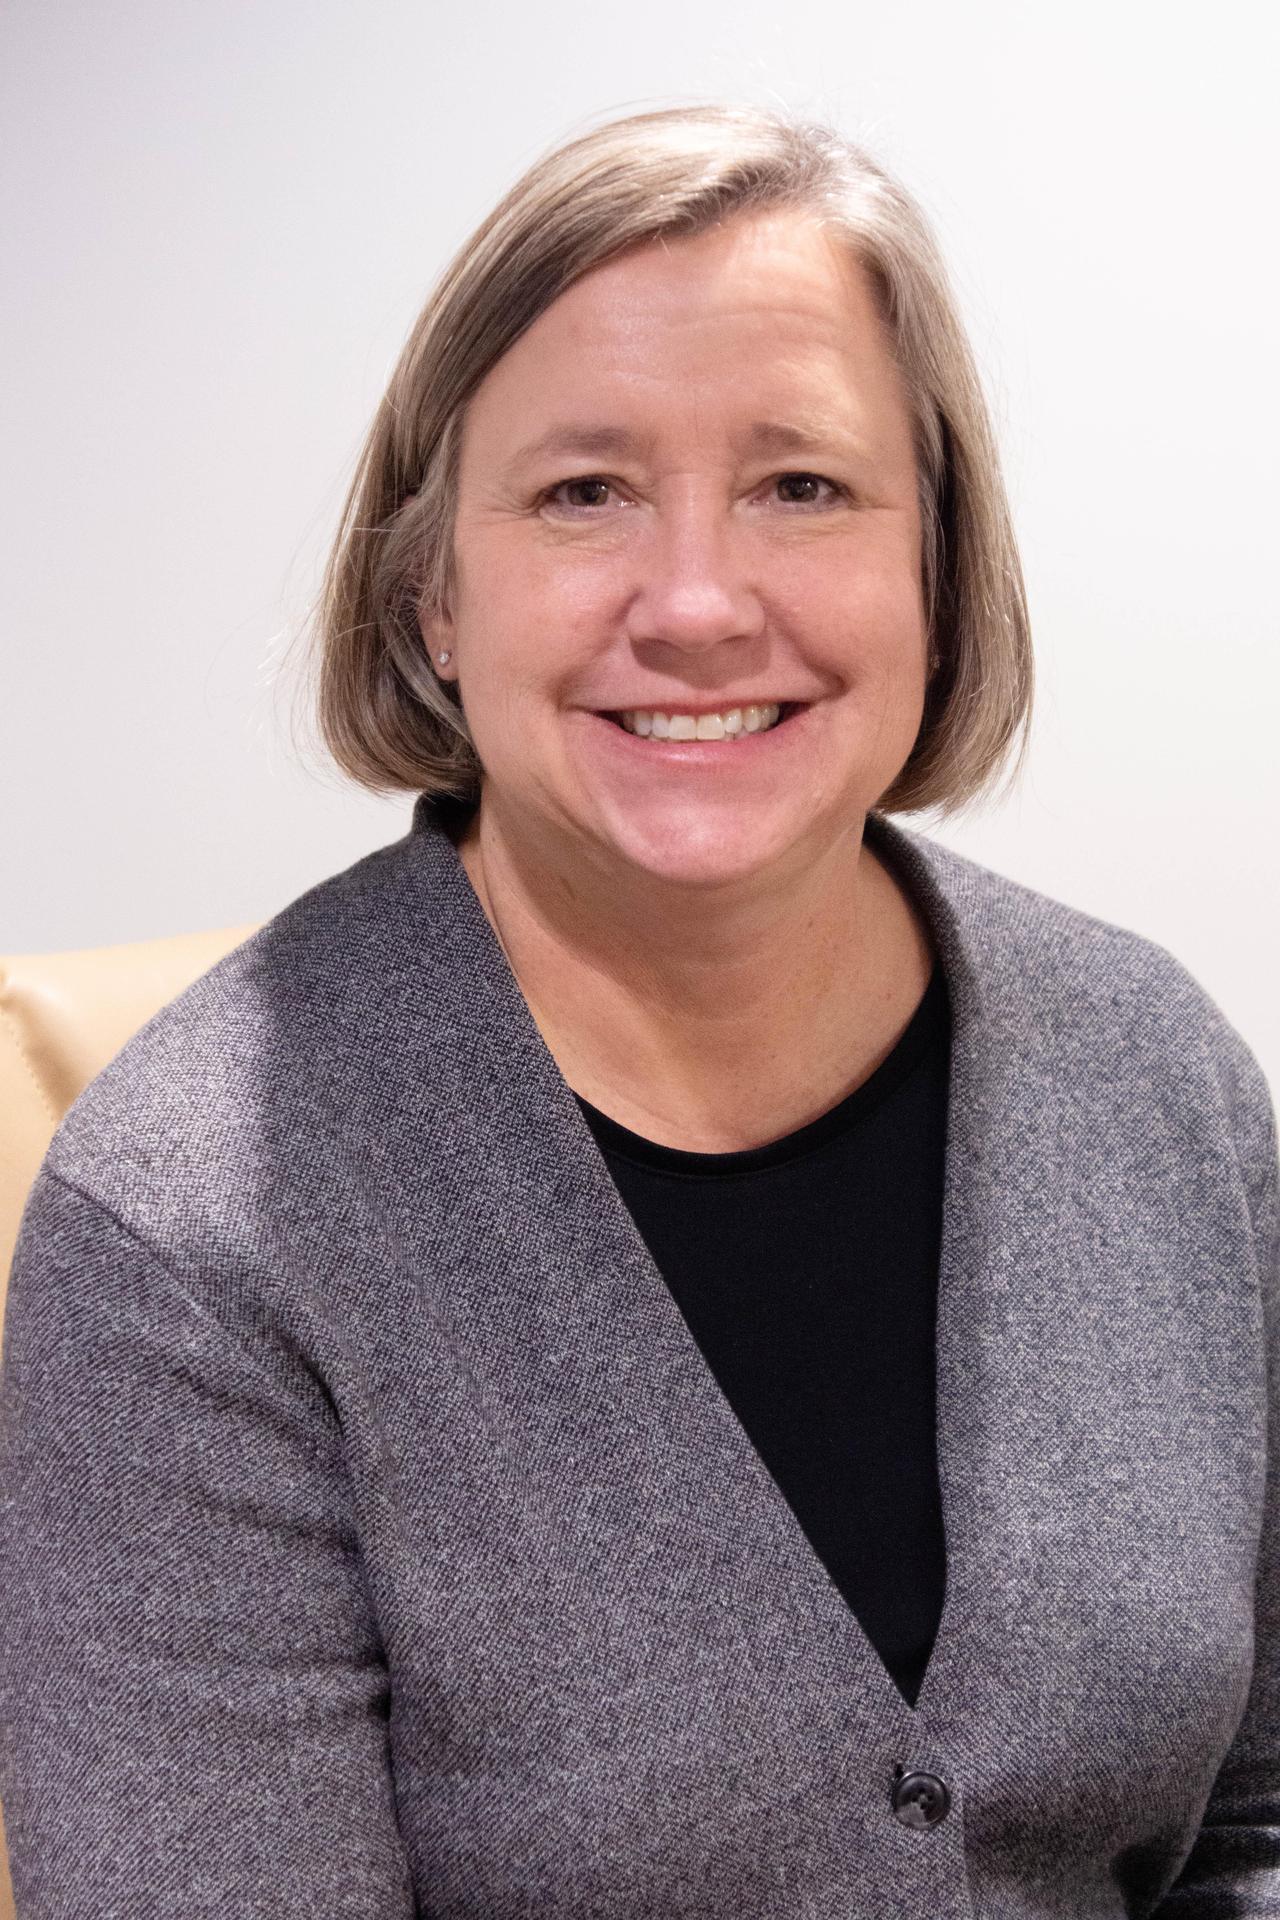 Board Vice President Debbie Ungar